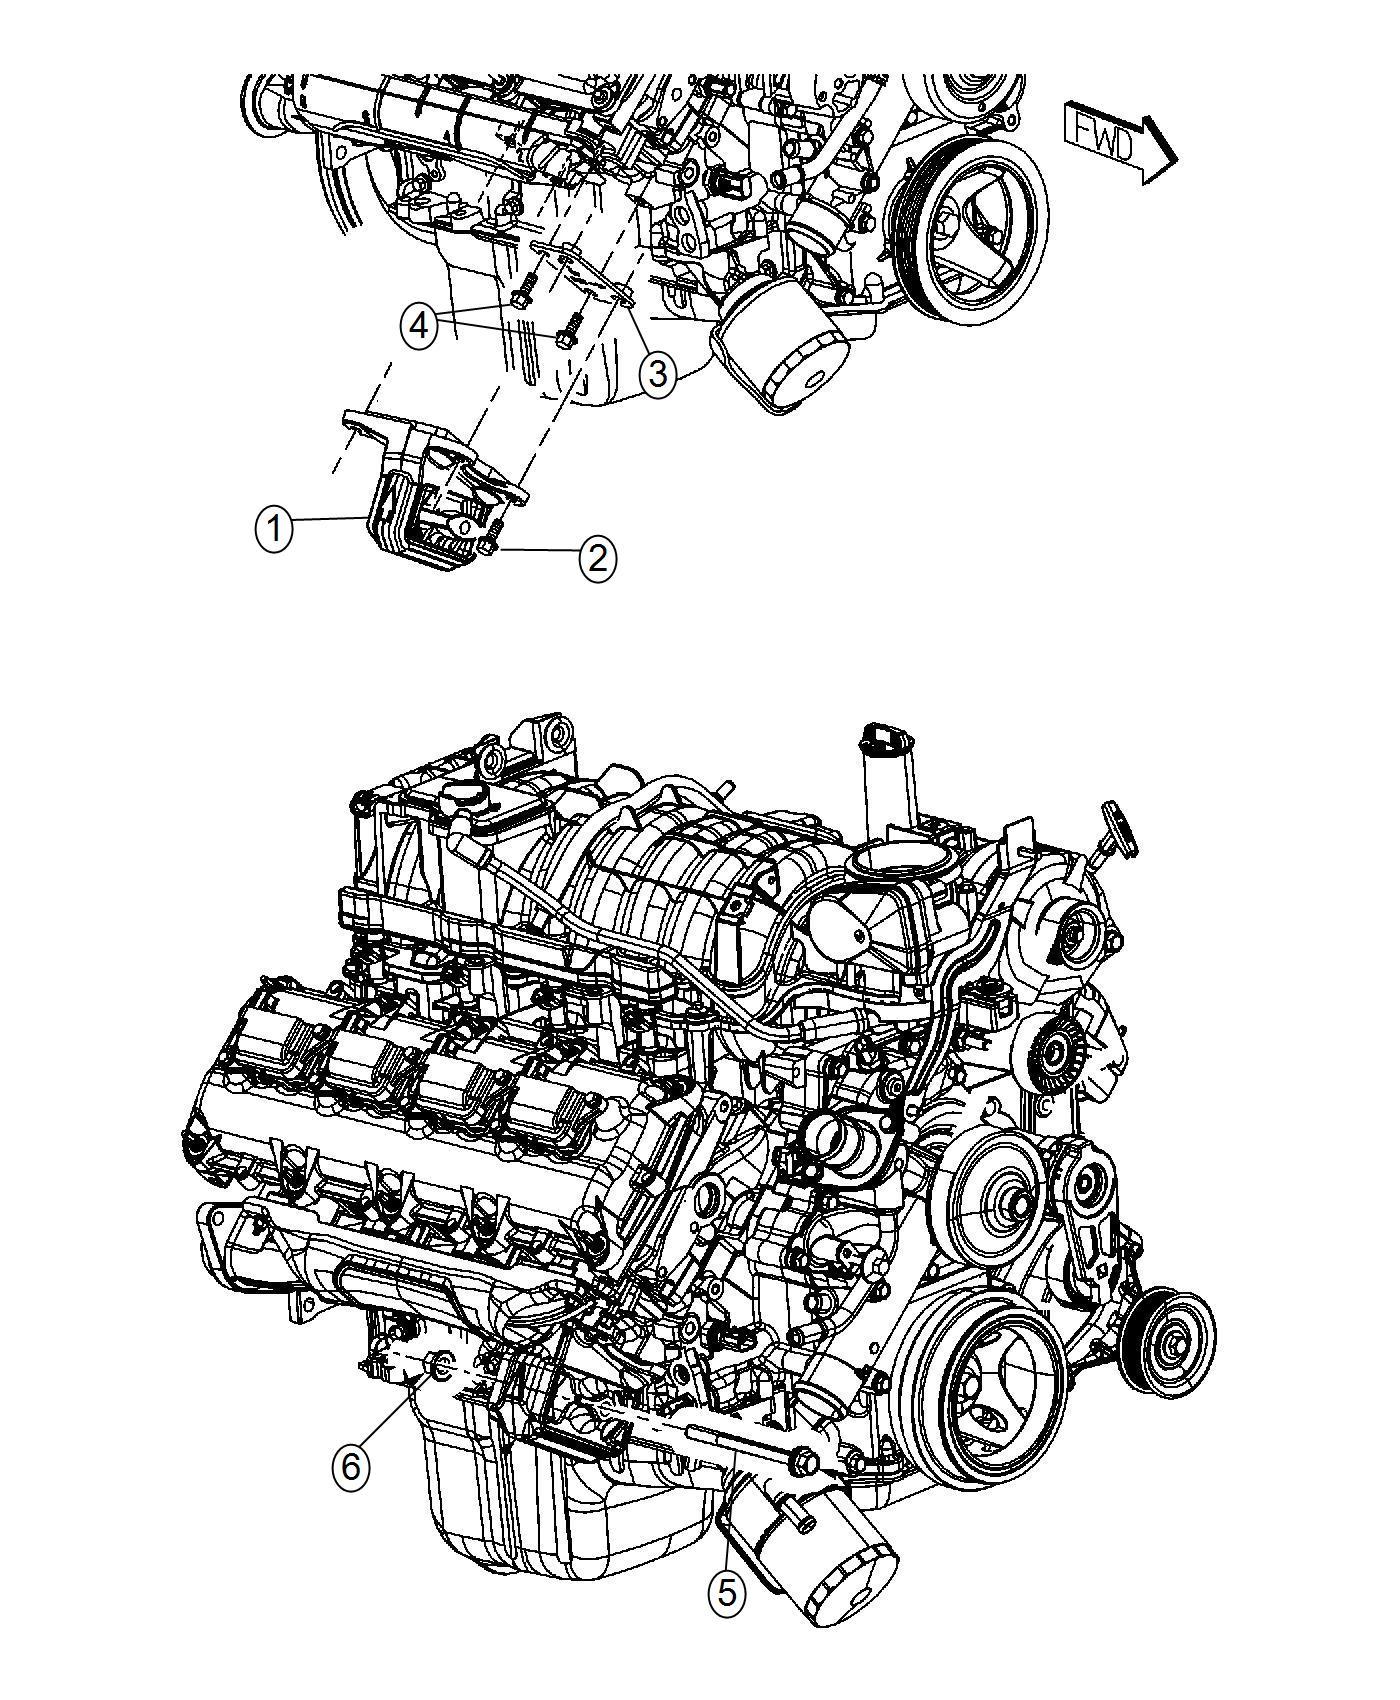 Ram Insulator Engine Mount Right Side Mounting